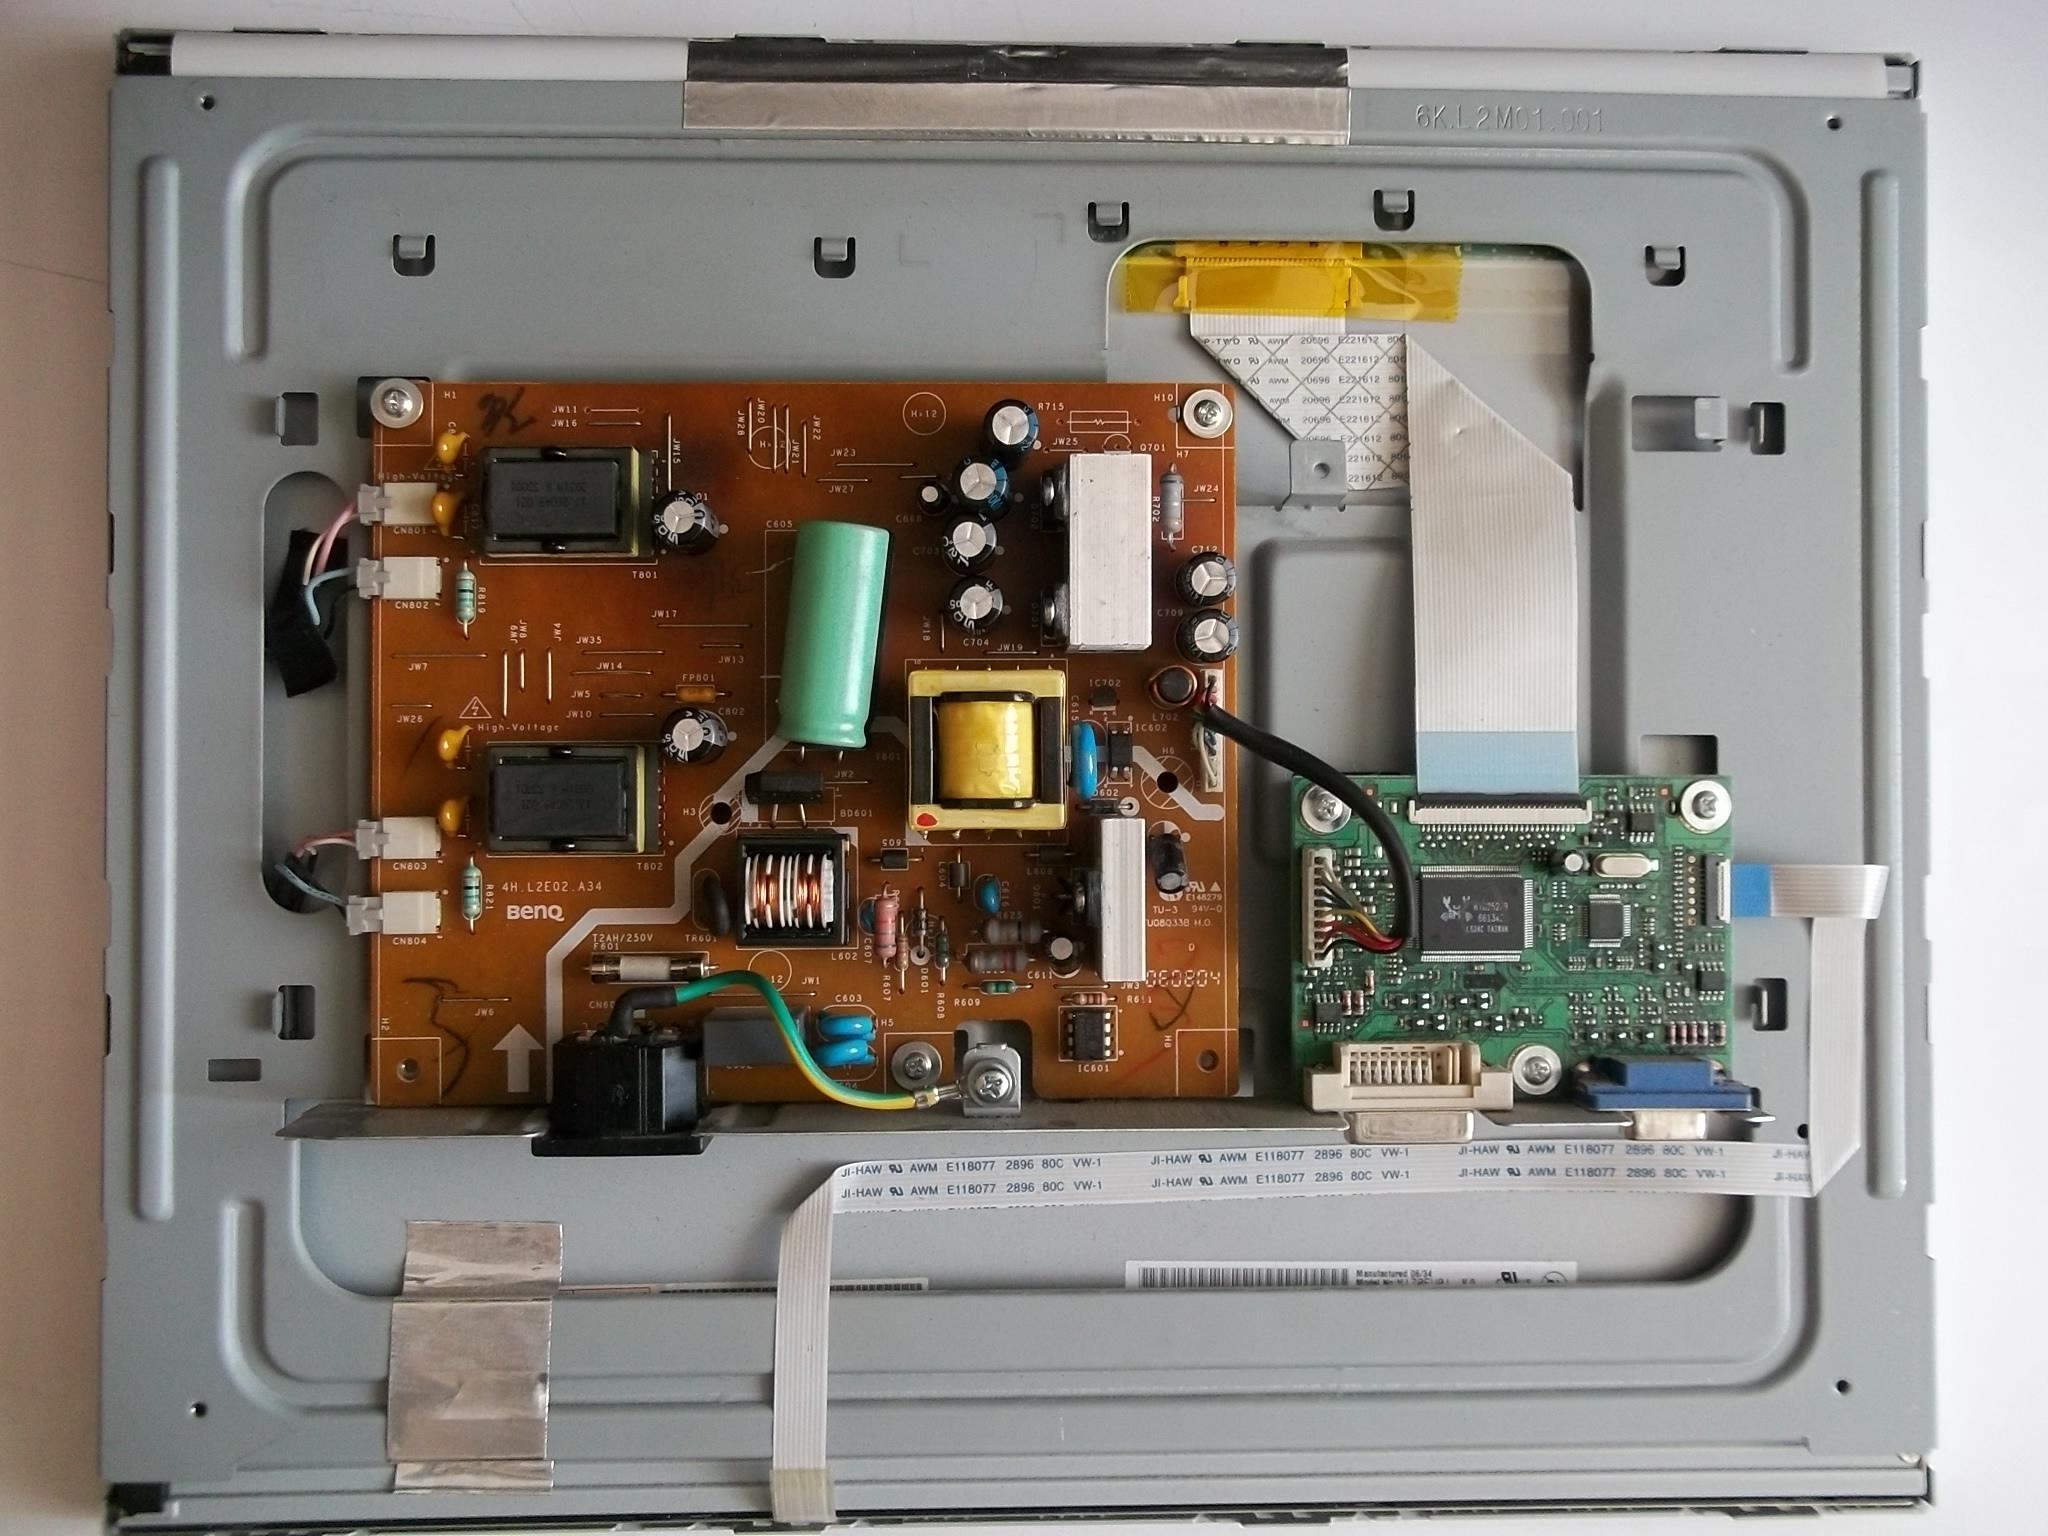 монитор benq схема платы q7t5